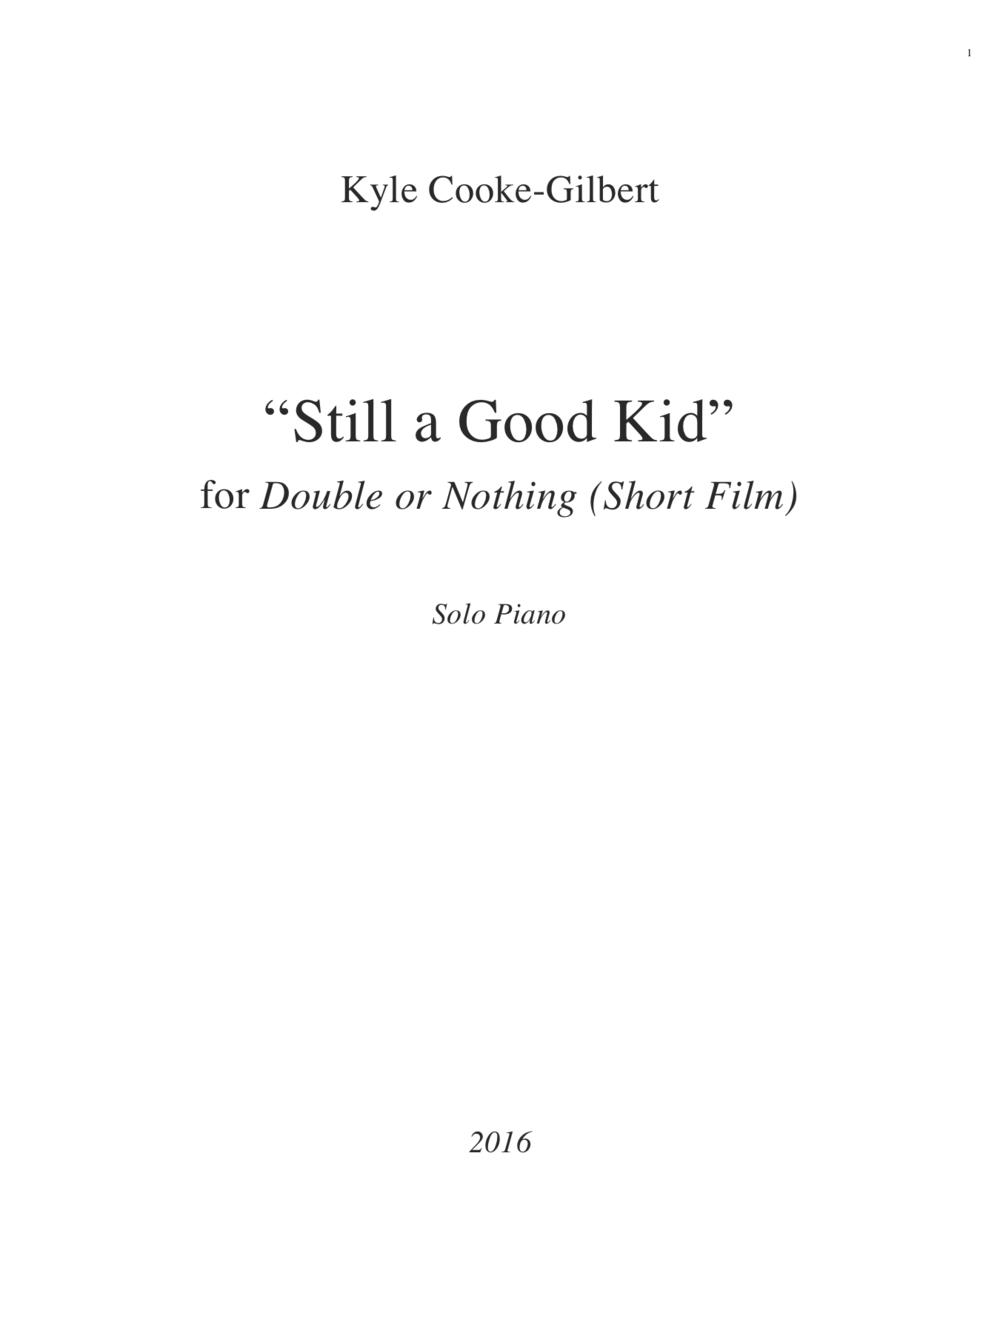 Still a Good Kid.png